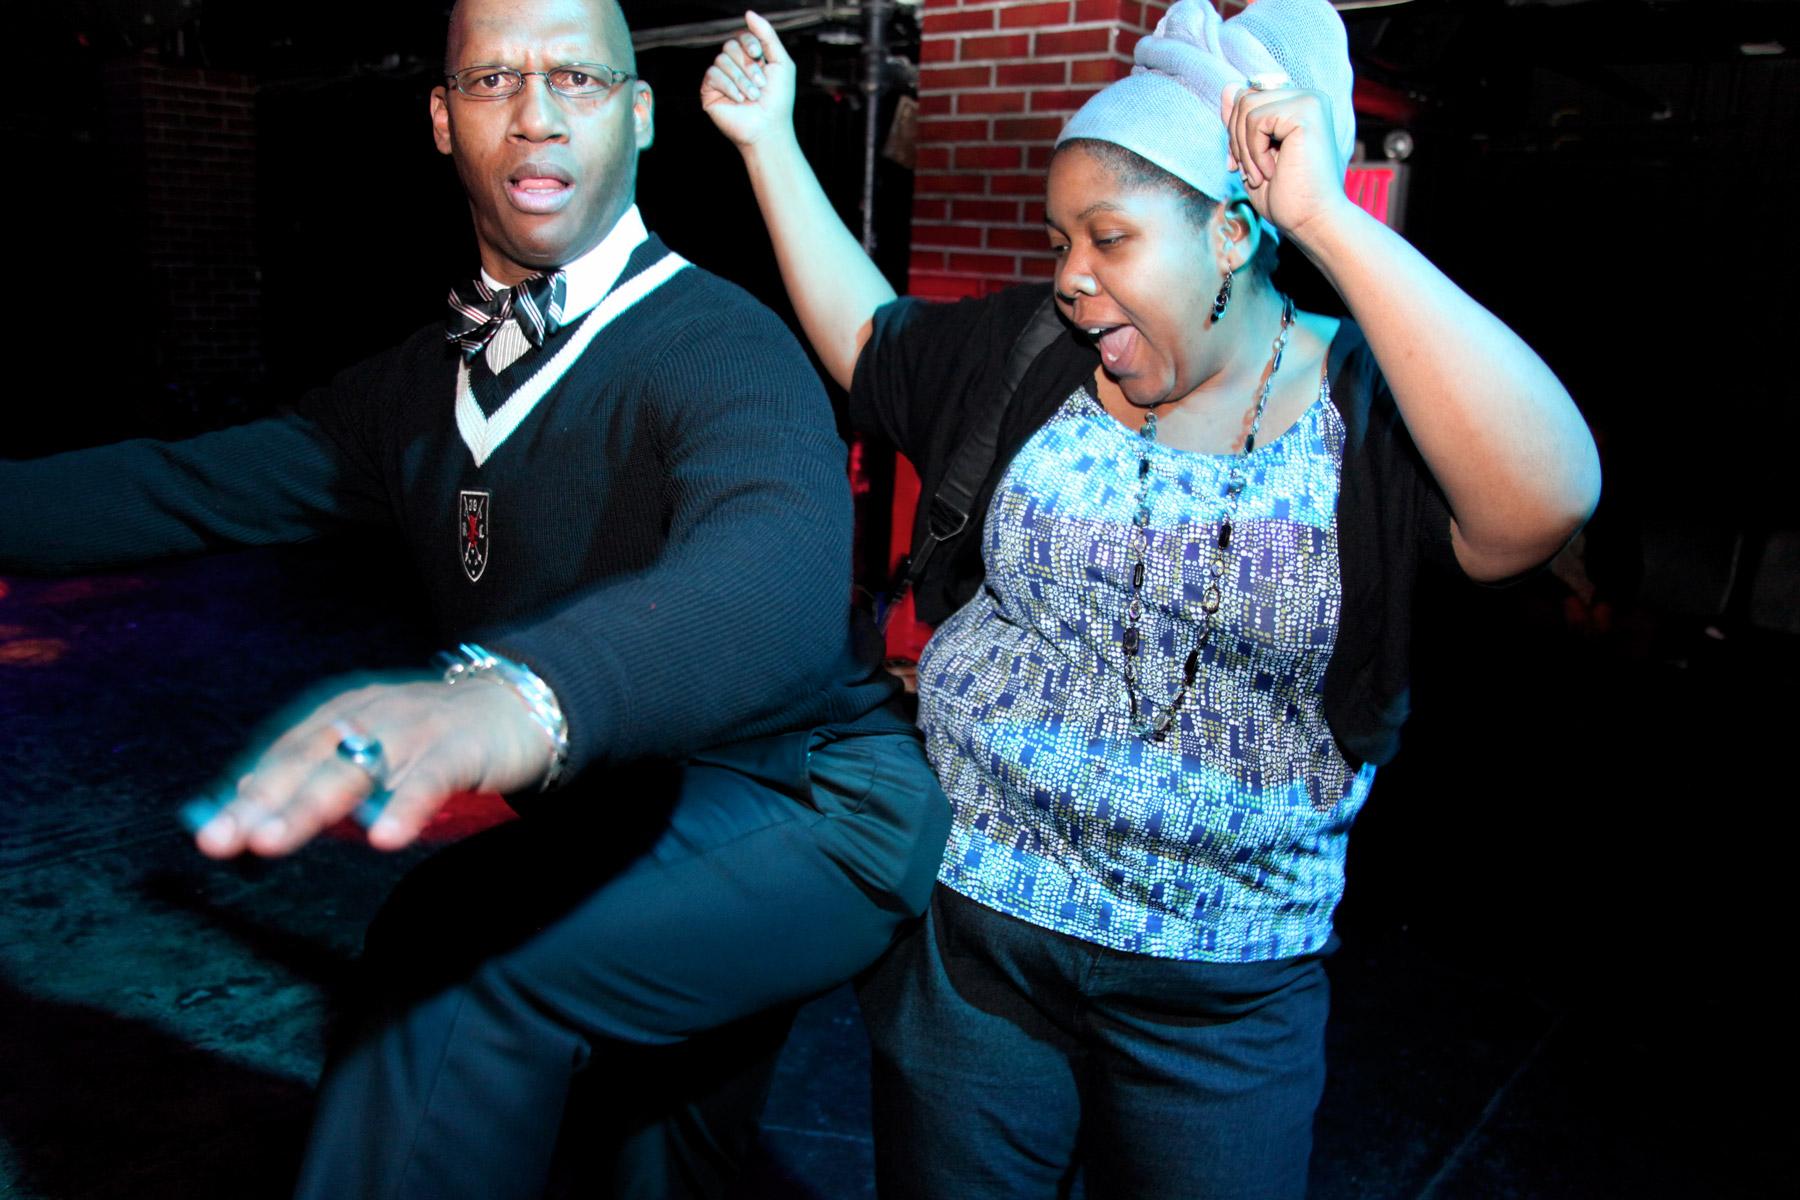 dancing_moments.jpg